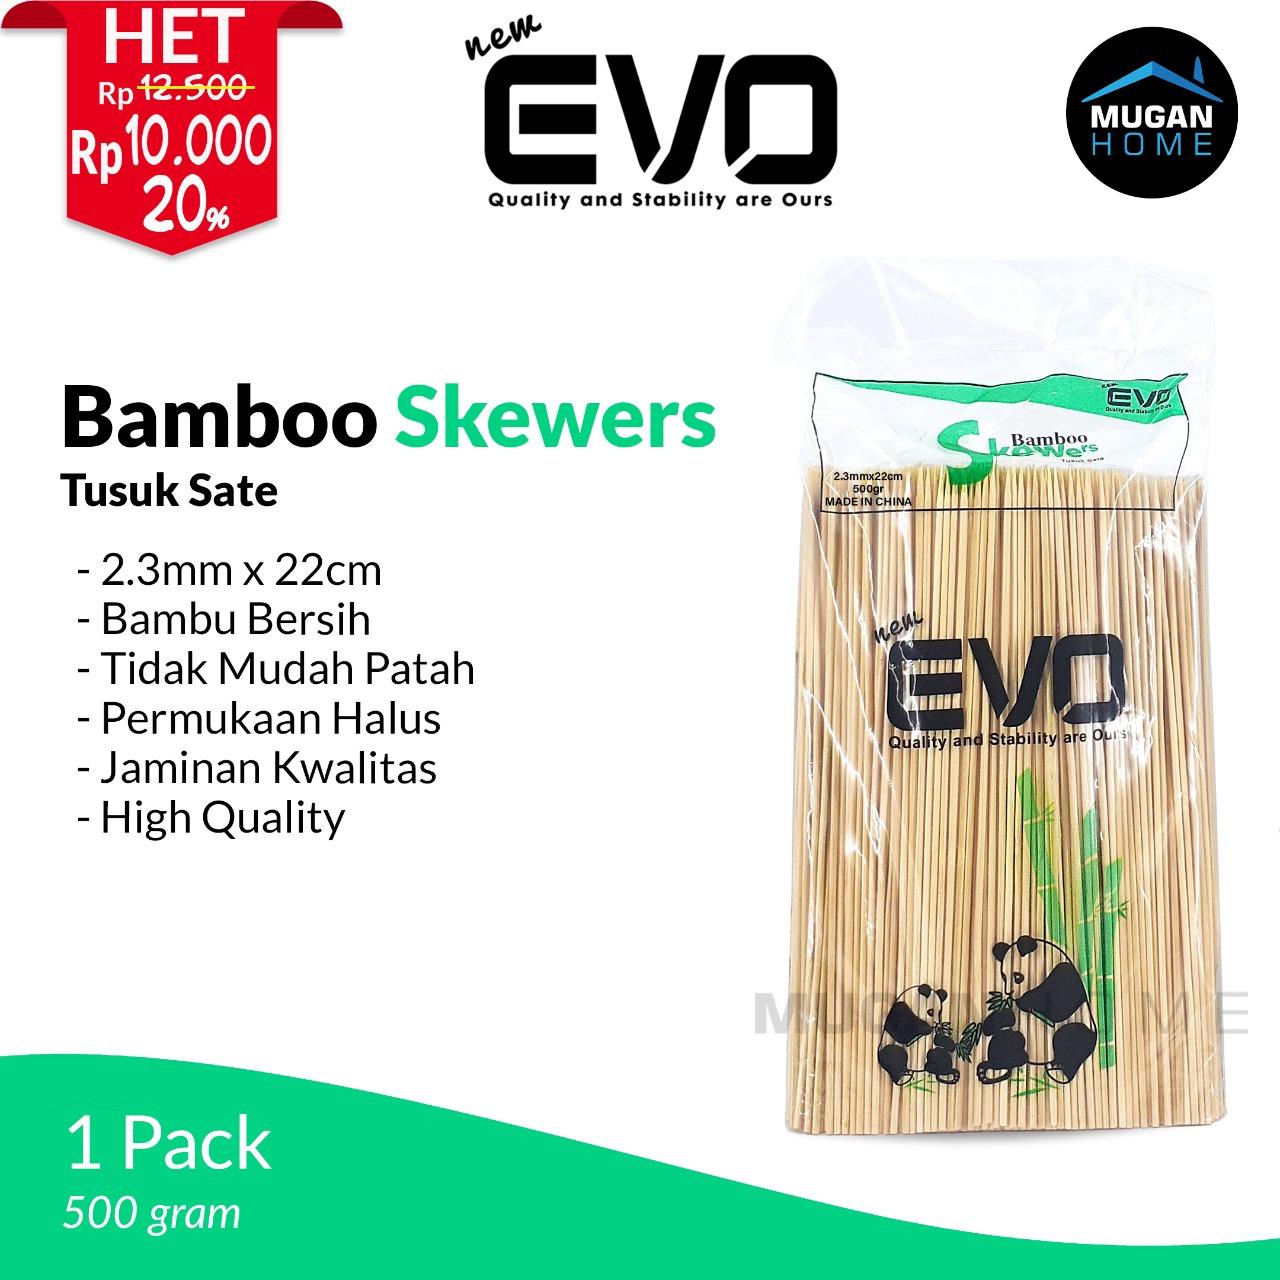 BAMBOO SKEWERS NEW EVO 500GRAM 2.3MM*22CM